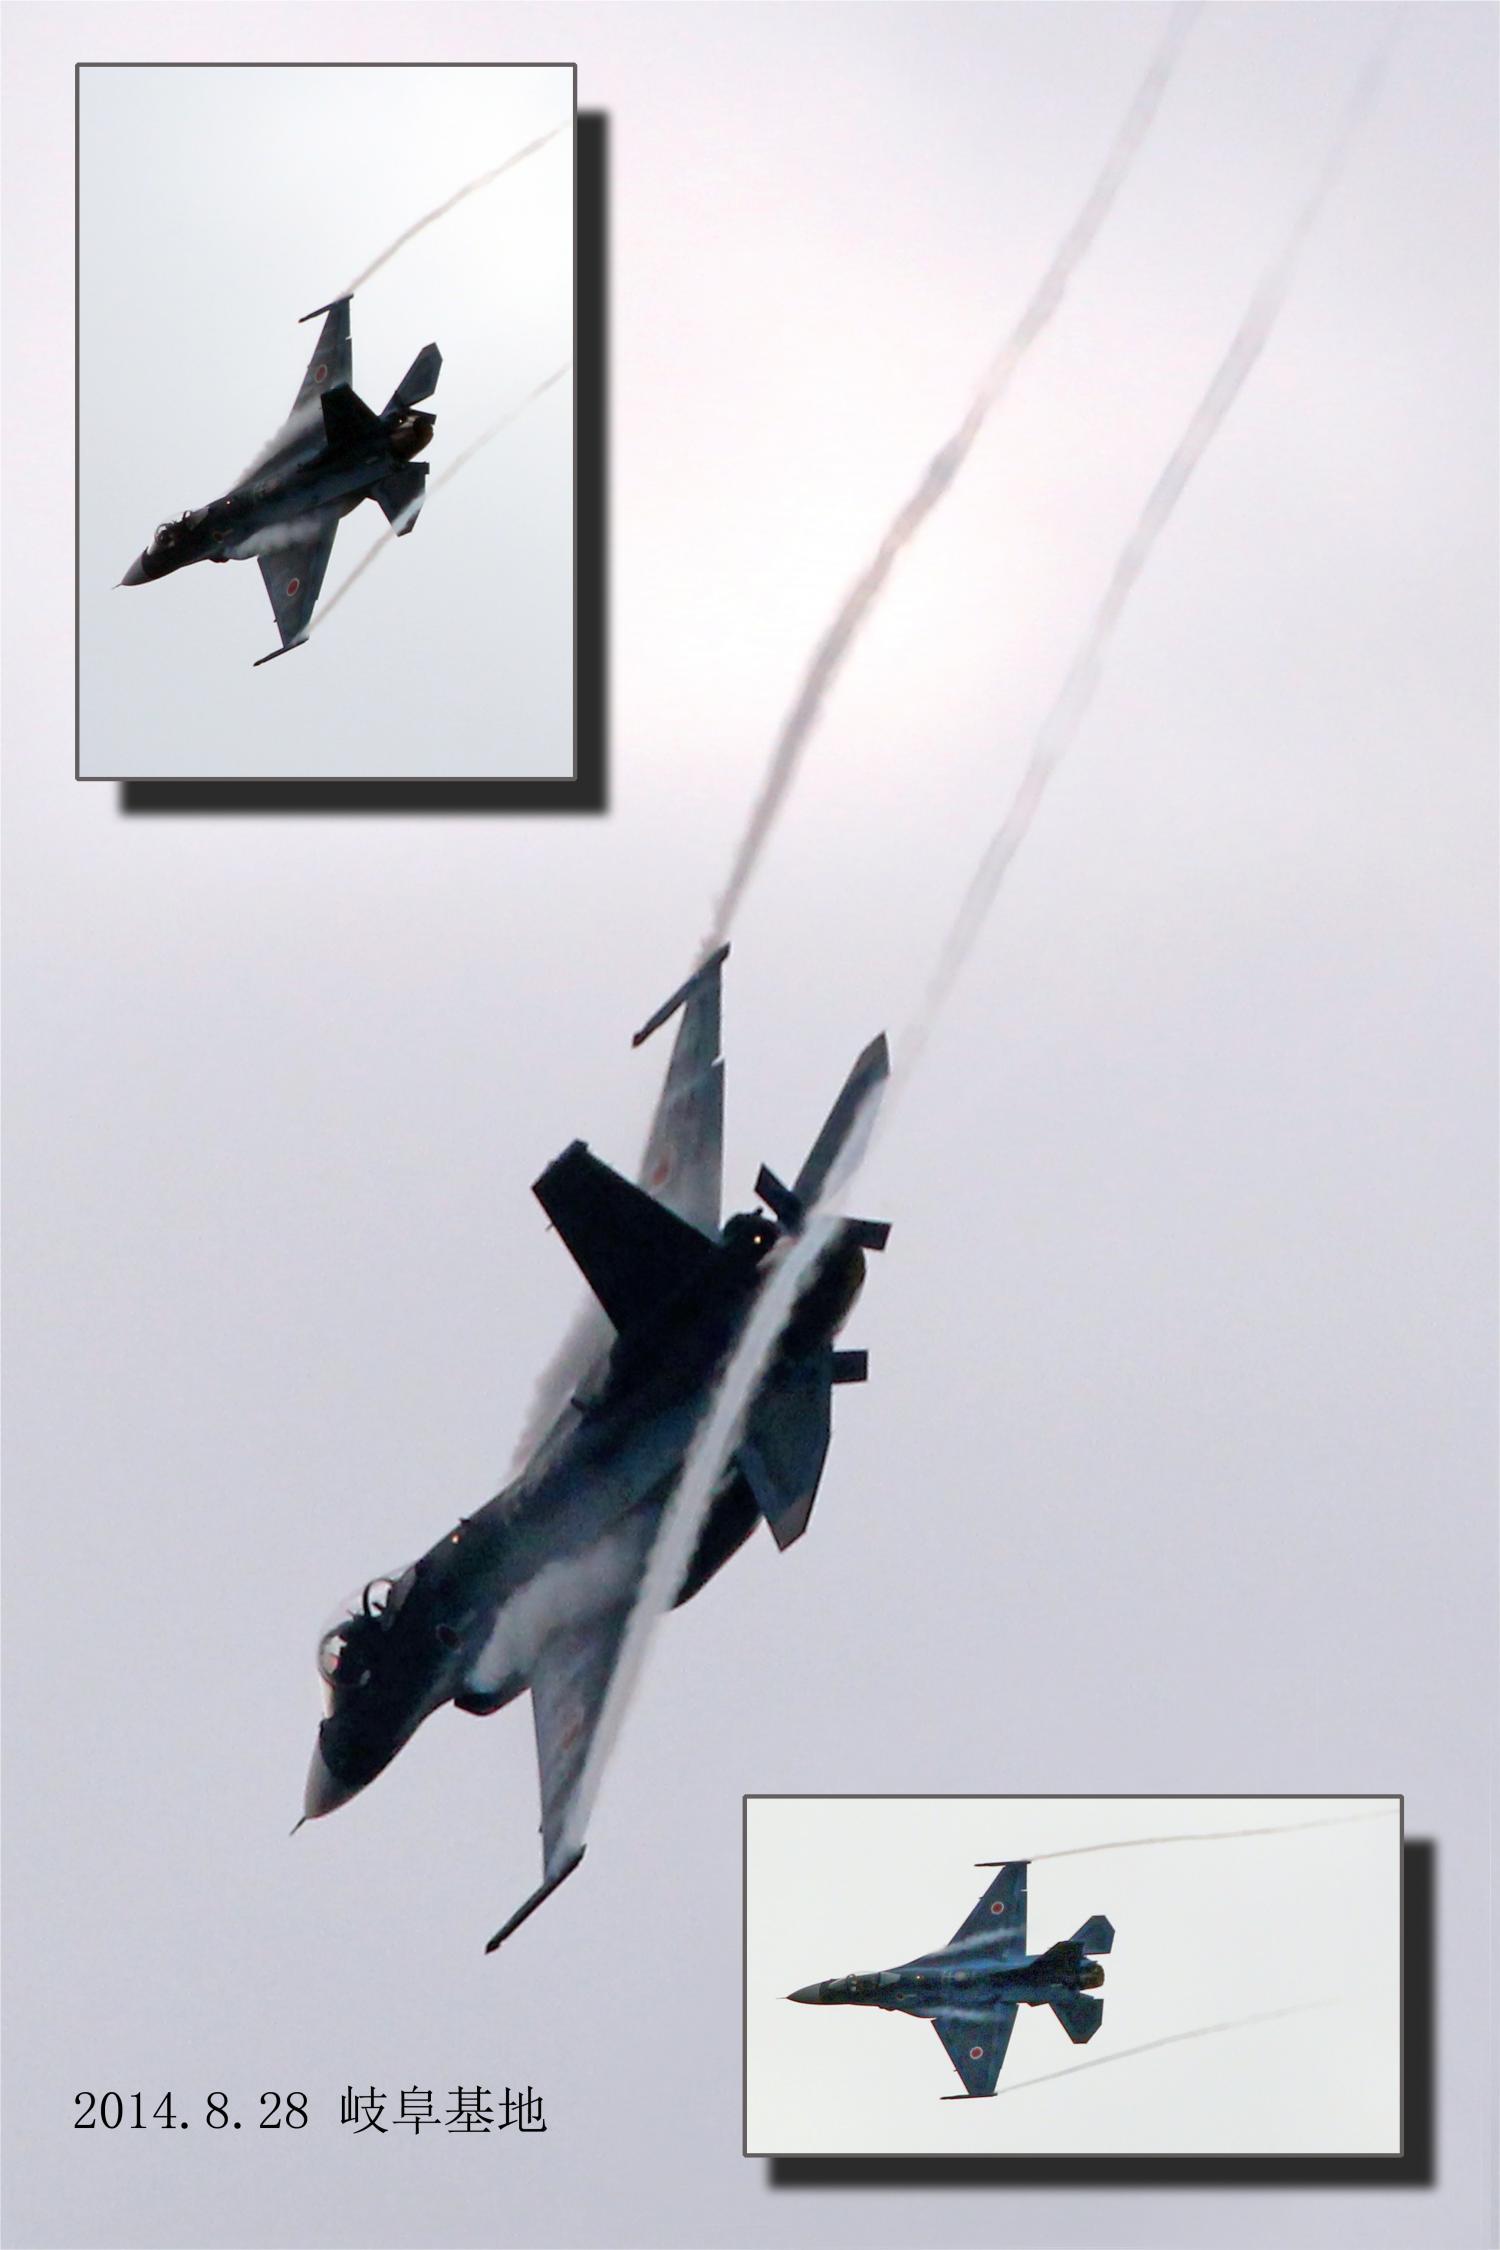 XC-2 岐阜基地